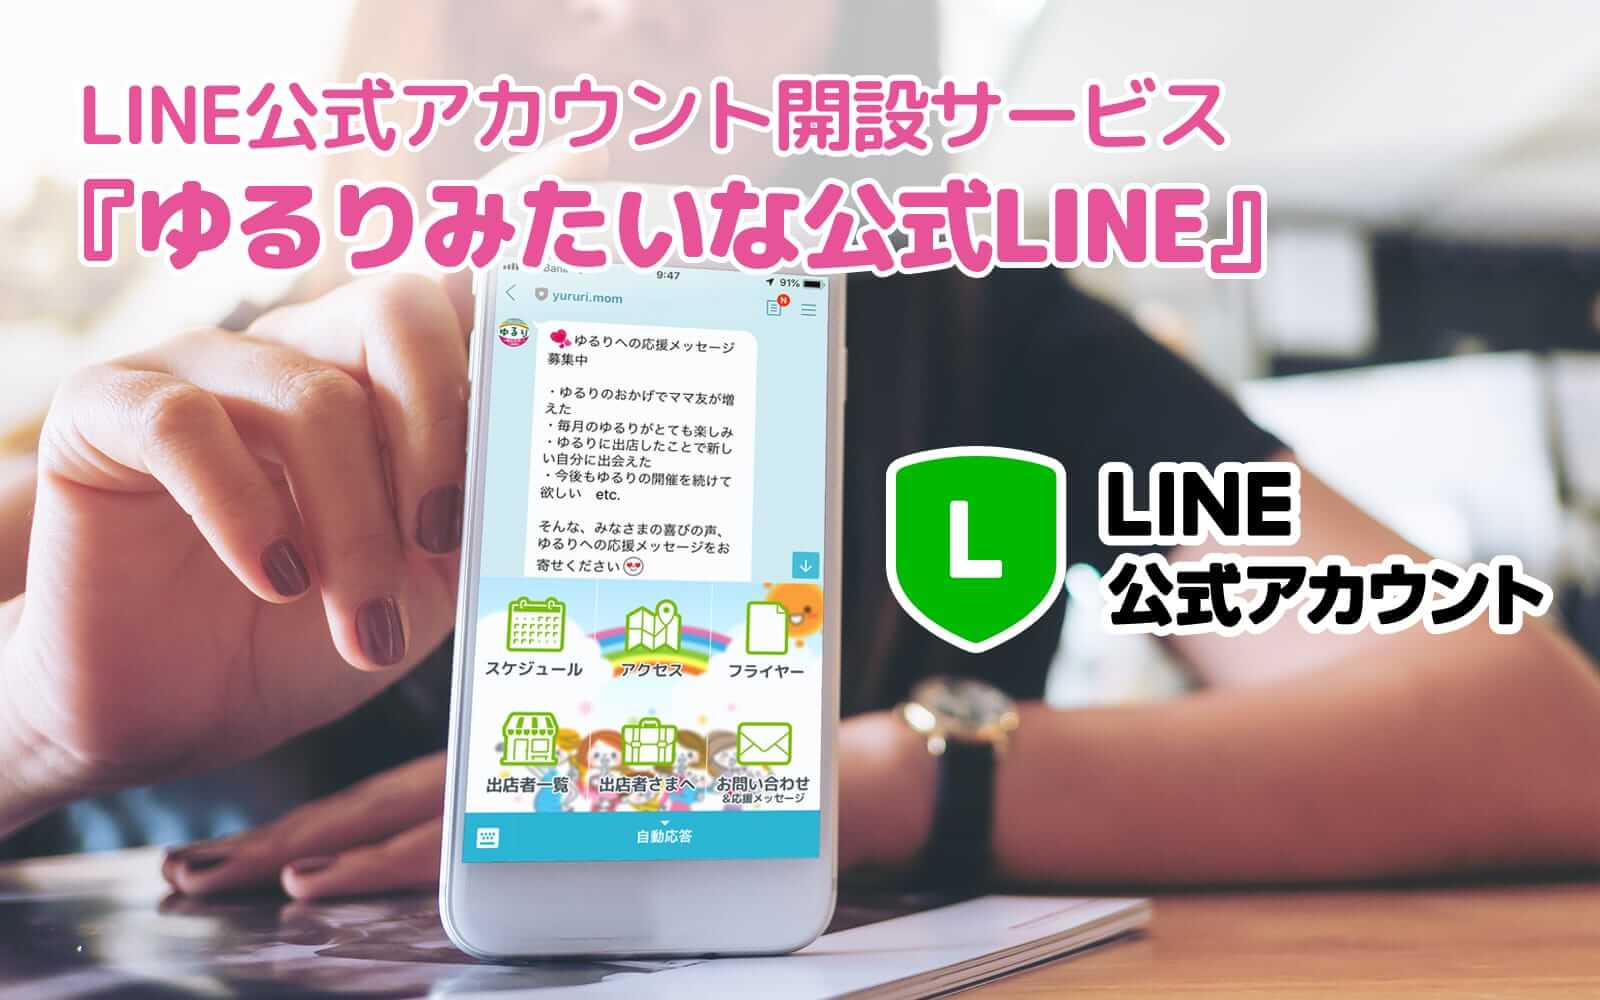 LINE公式アカウント開設サービス『ゆるりみたいな公式LINE』